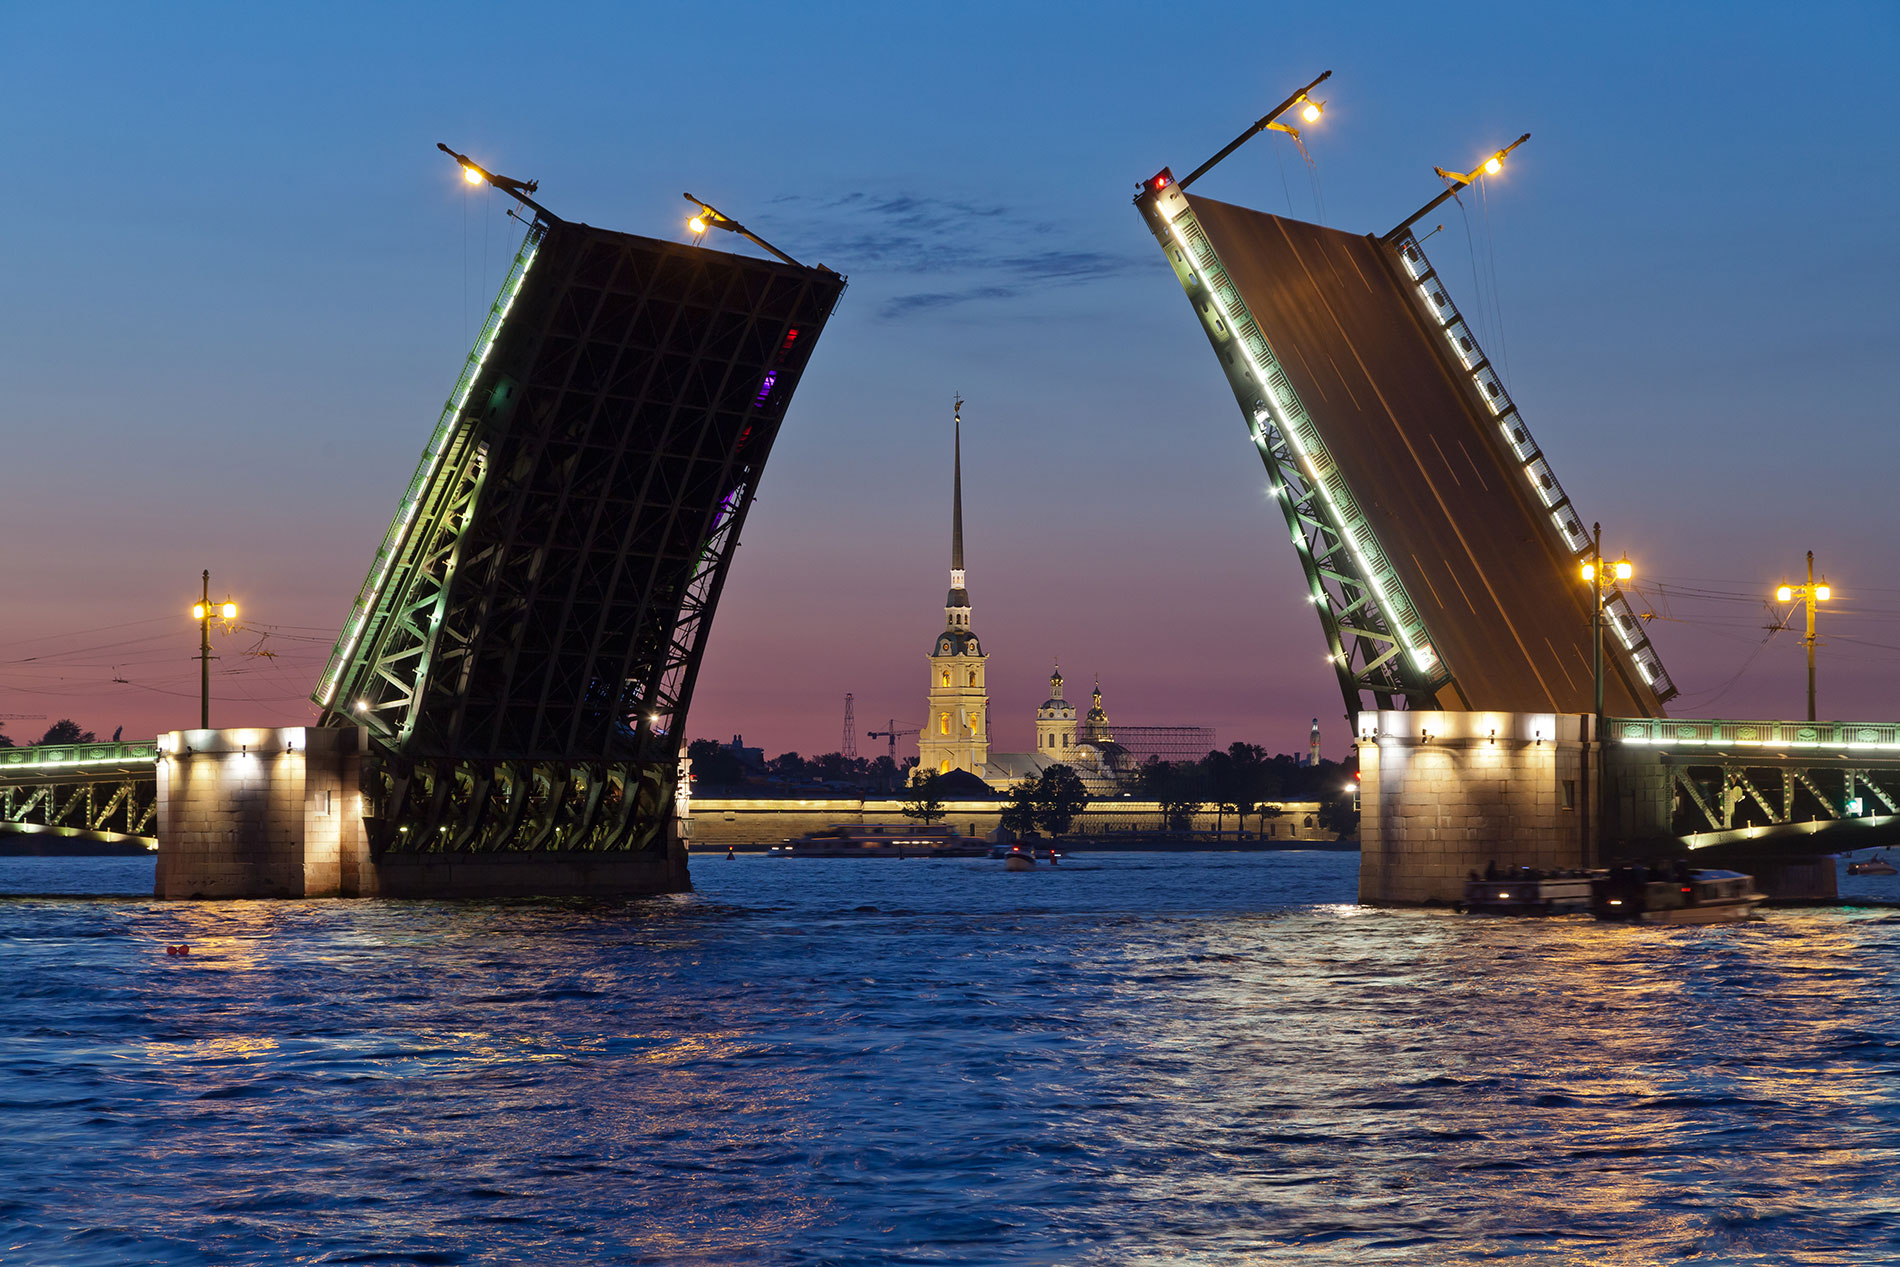 кредиты санкт-петербург физическим